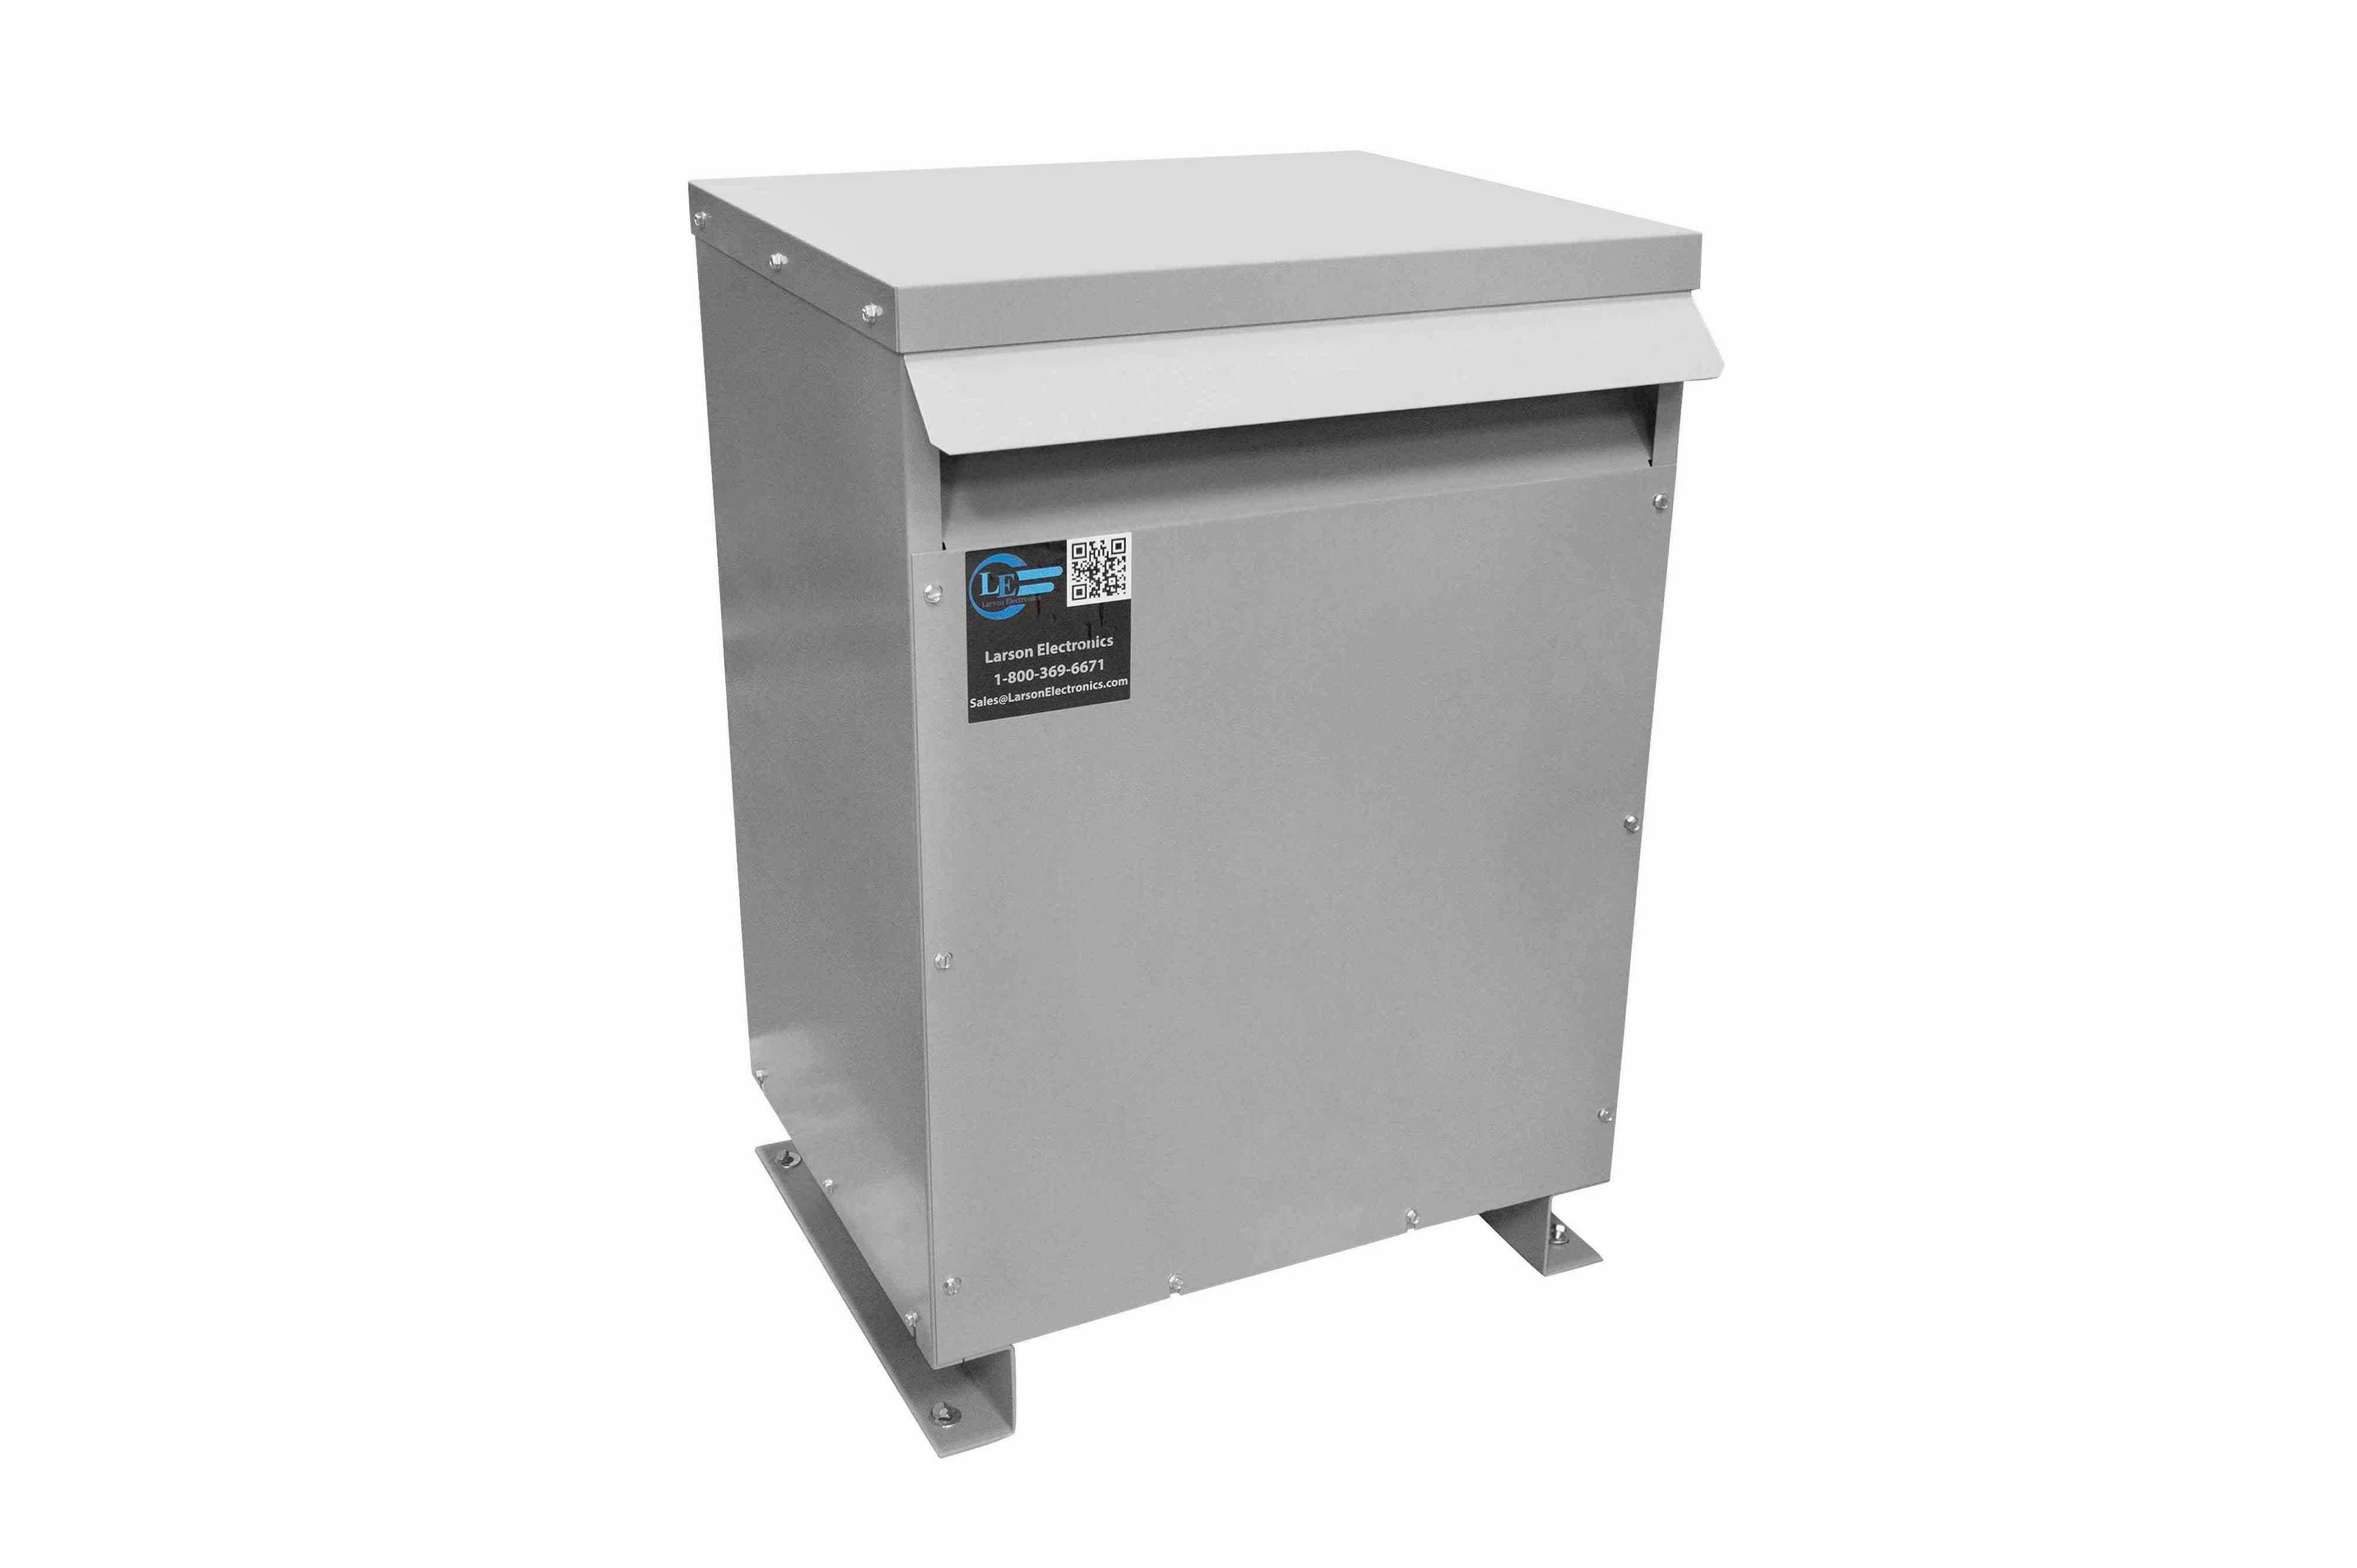 22.5 kVA 3PH Isolation Transformer, 575V Wye Primary, 380Y/220 Wye-N Secondary, N3R, Ventilated, 60 Hz